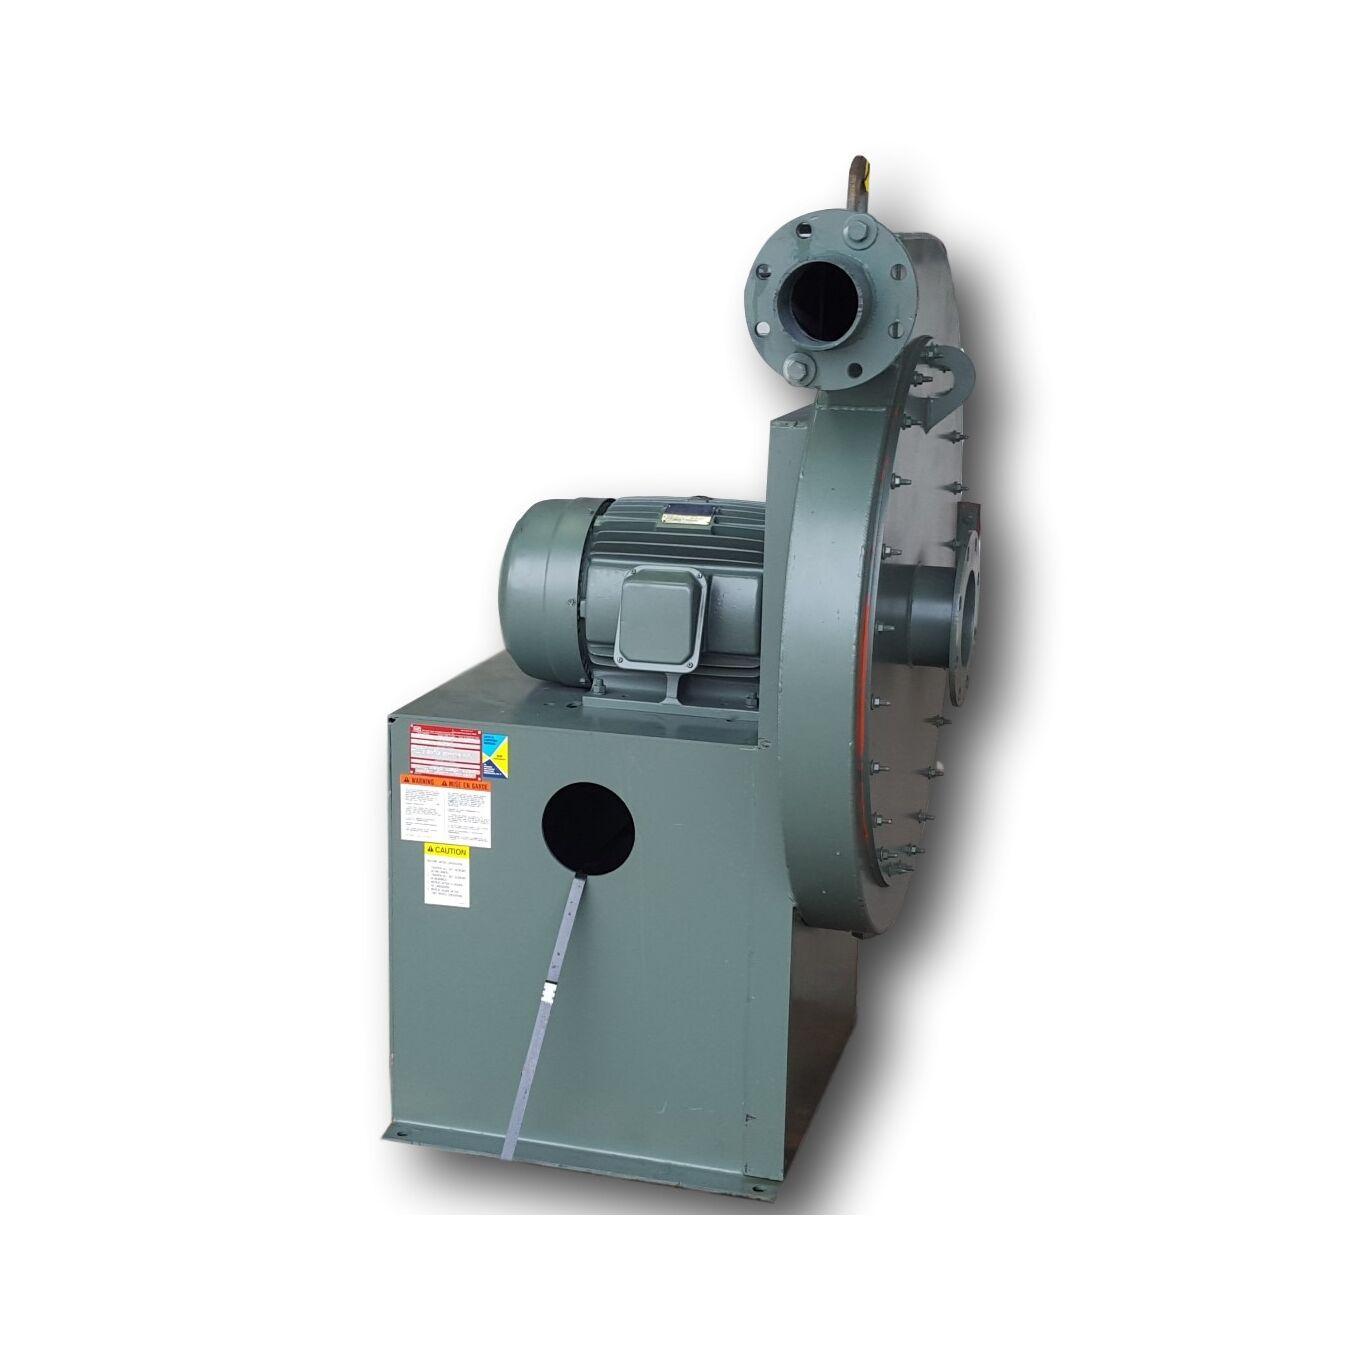 61 SP Unused 20 HP New York Pressure Blower 290 Alum : Fans & B  #934038